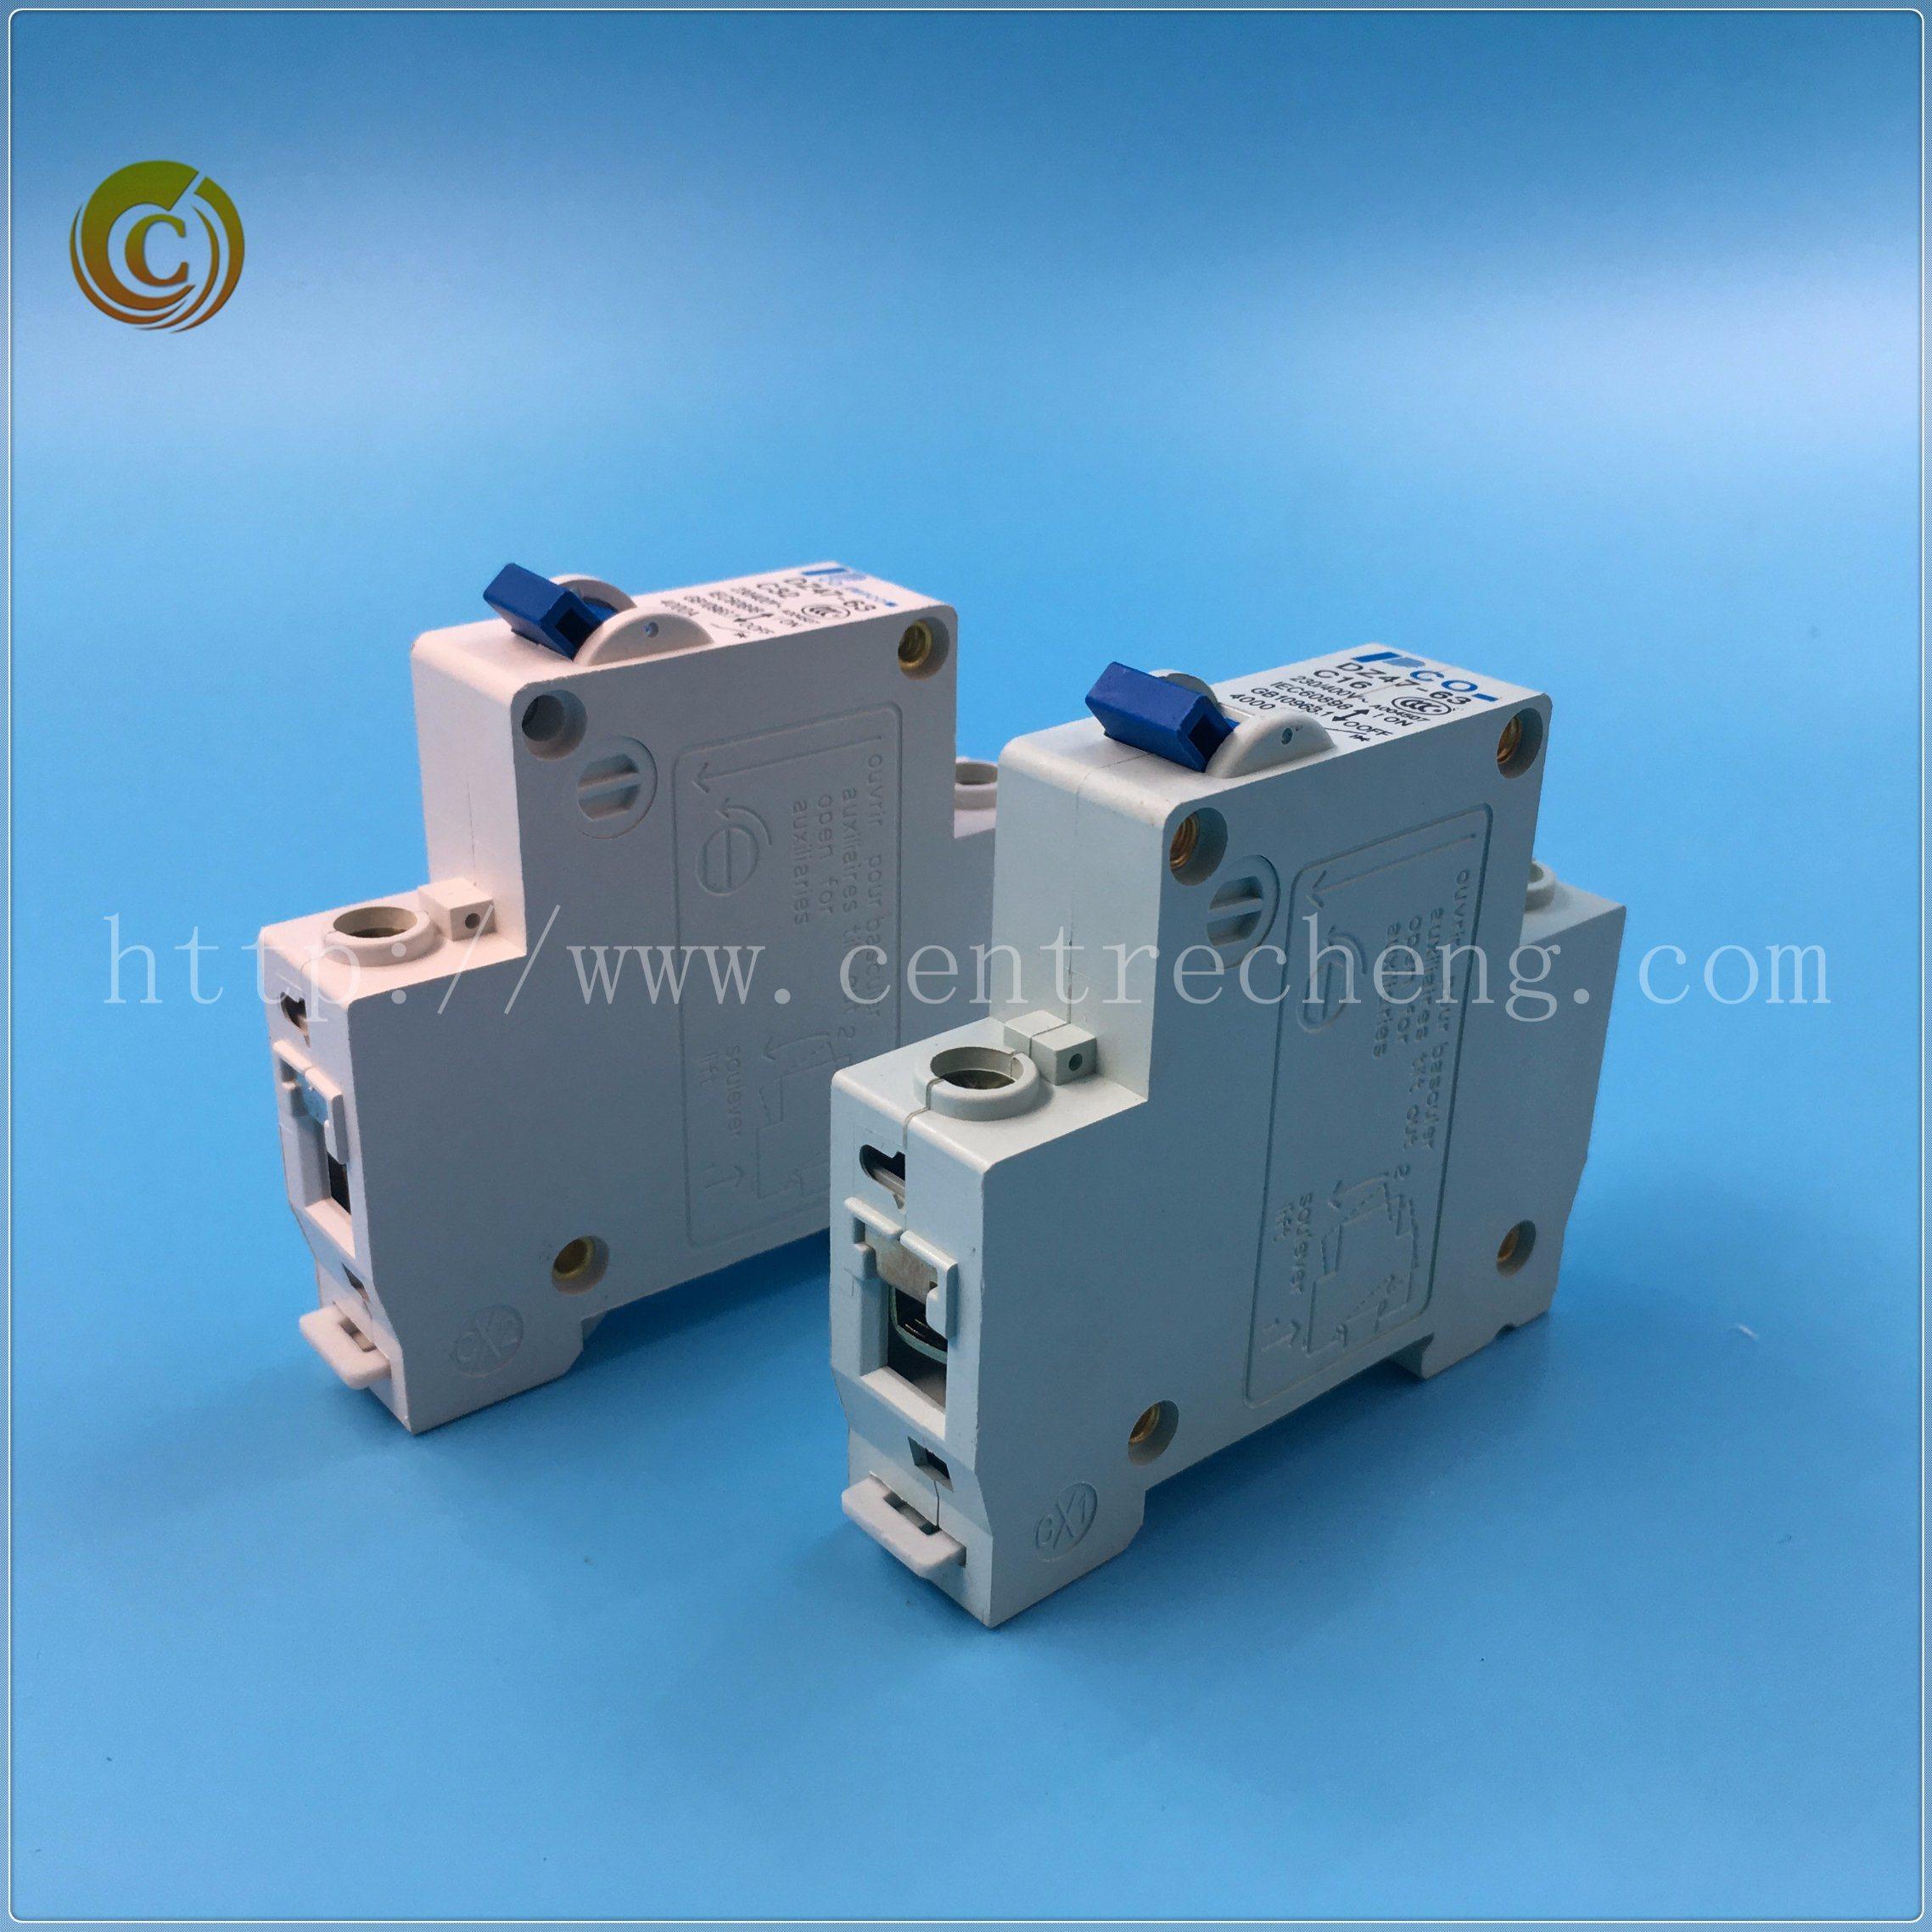 2018 Vacuum Circuit Breaker Electrical Contact MCB Breaker Moulded Case  Circuit Breaker